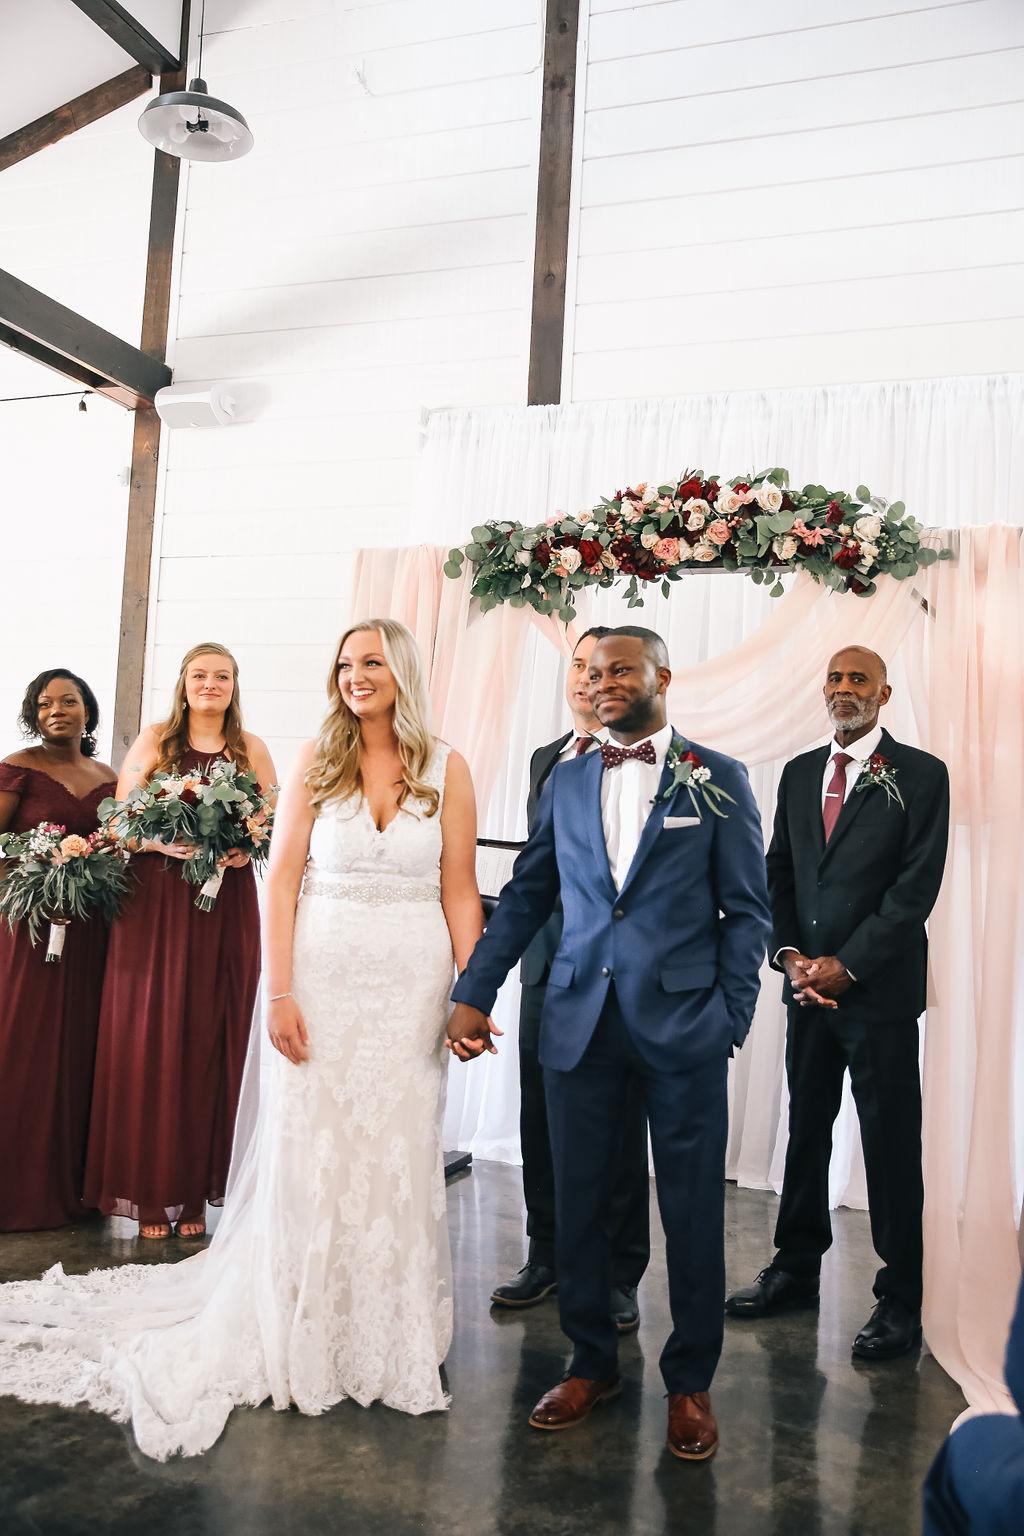 Tulsa Wedding White Barn 52.JPG